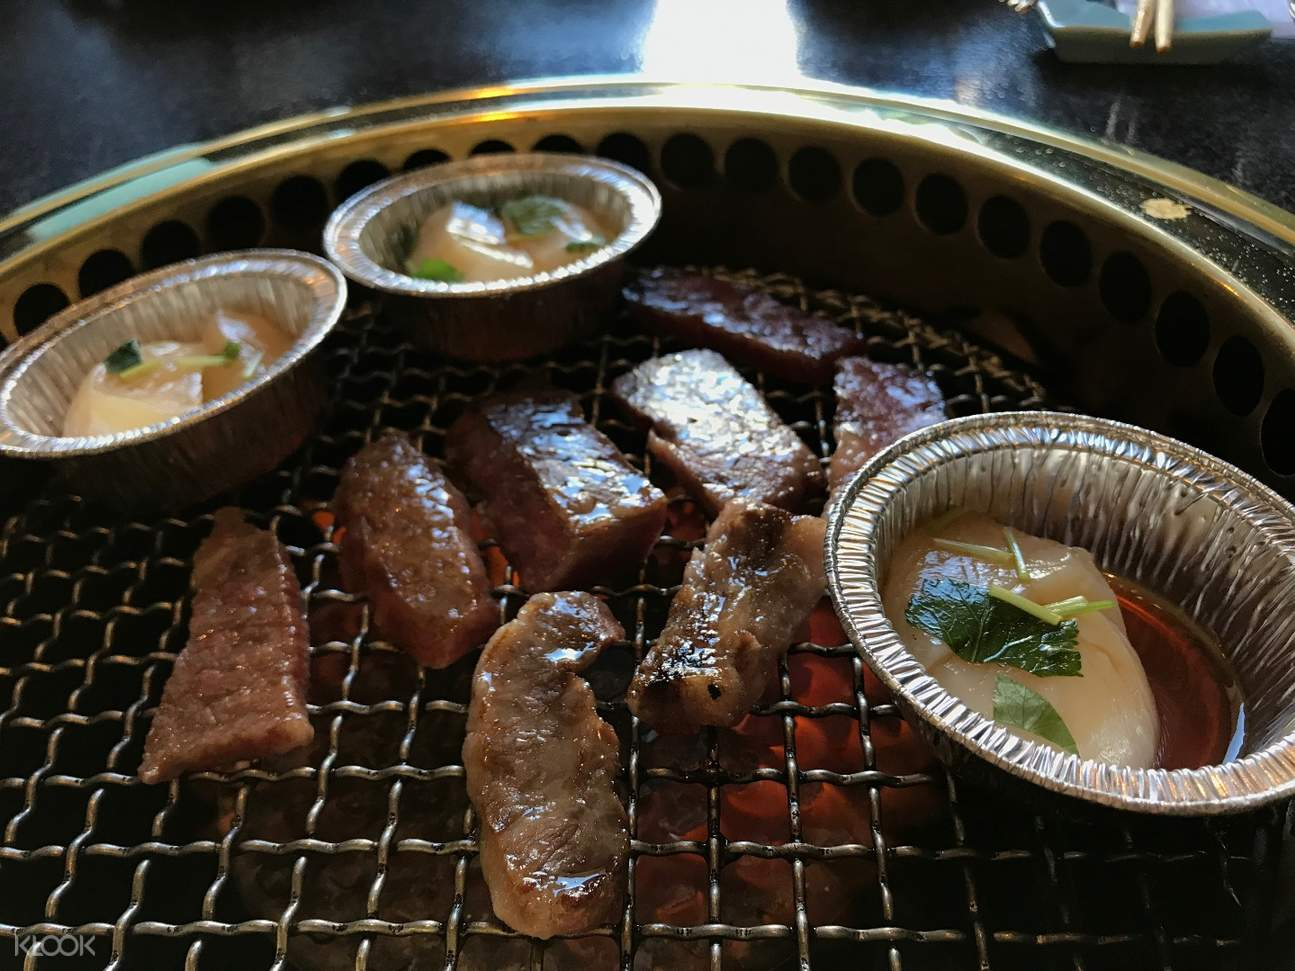 Yakiniku-Tei Rokkasen (焼肉亭 六歌仙) in Shinjuku - Popular Eat-All-You-Can Japanese BBQ